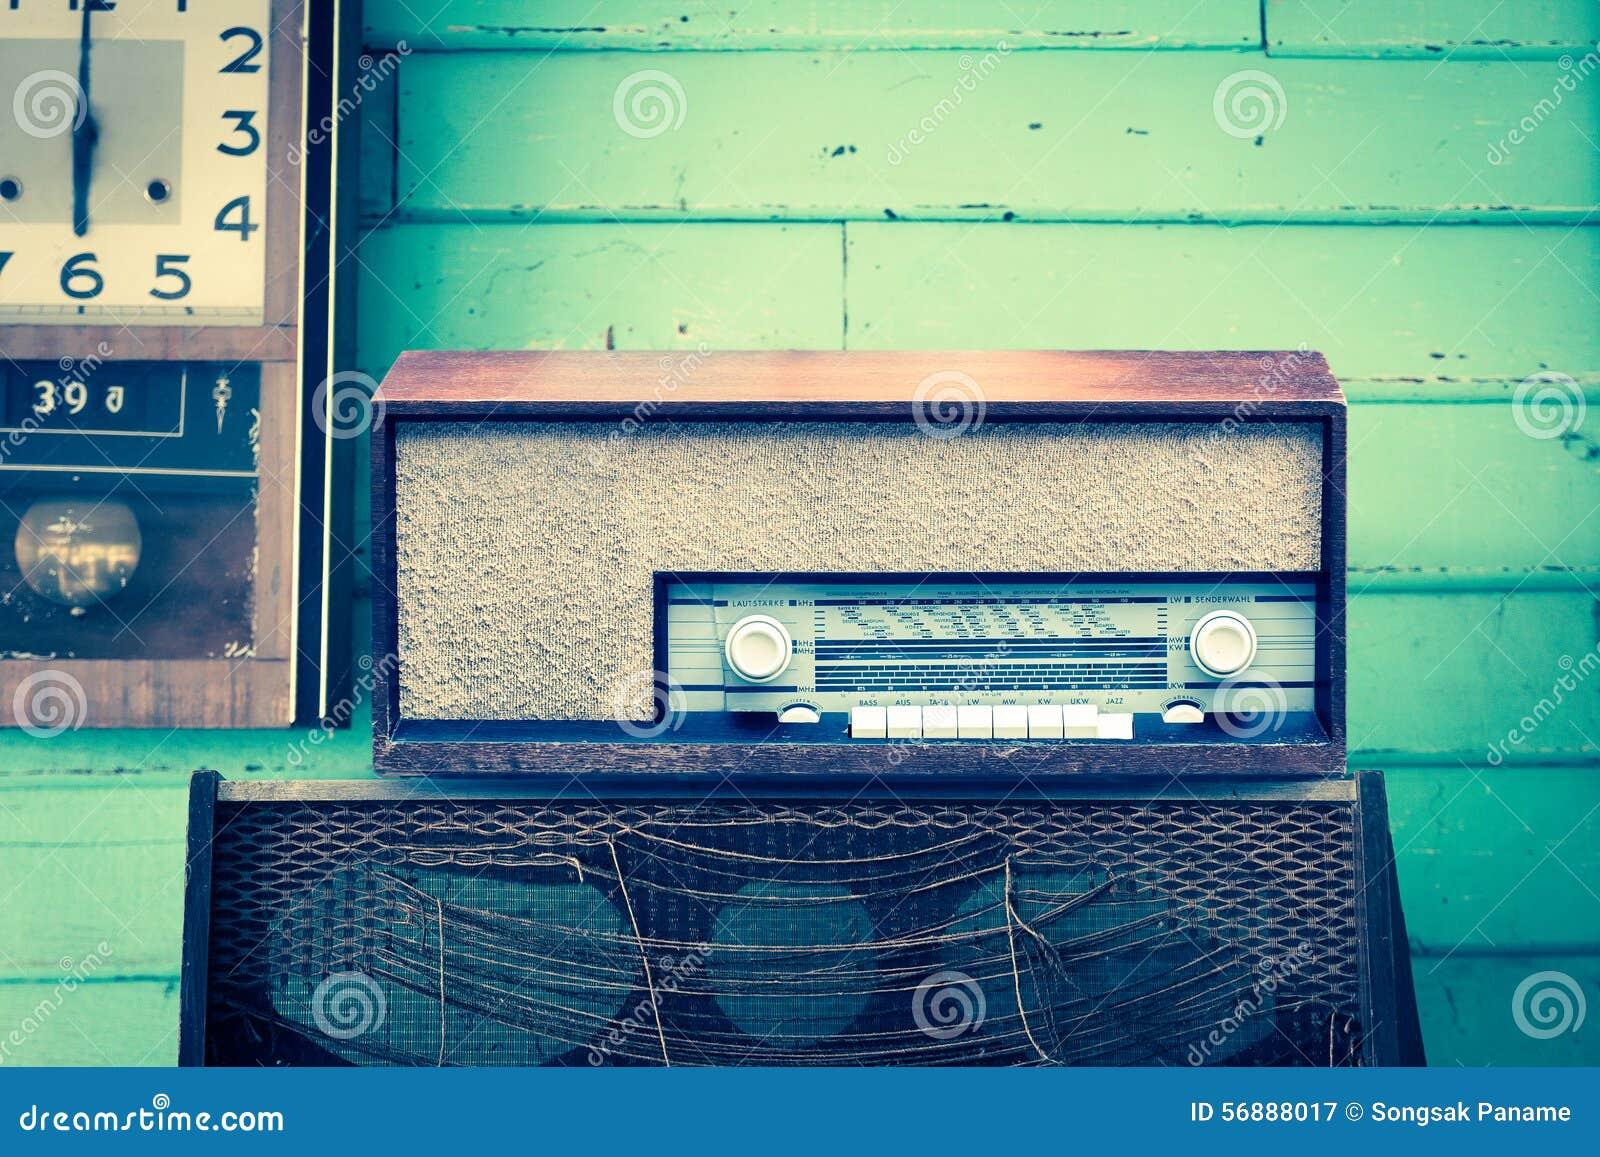 Retro giocatore radiofonico